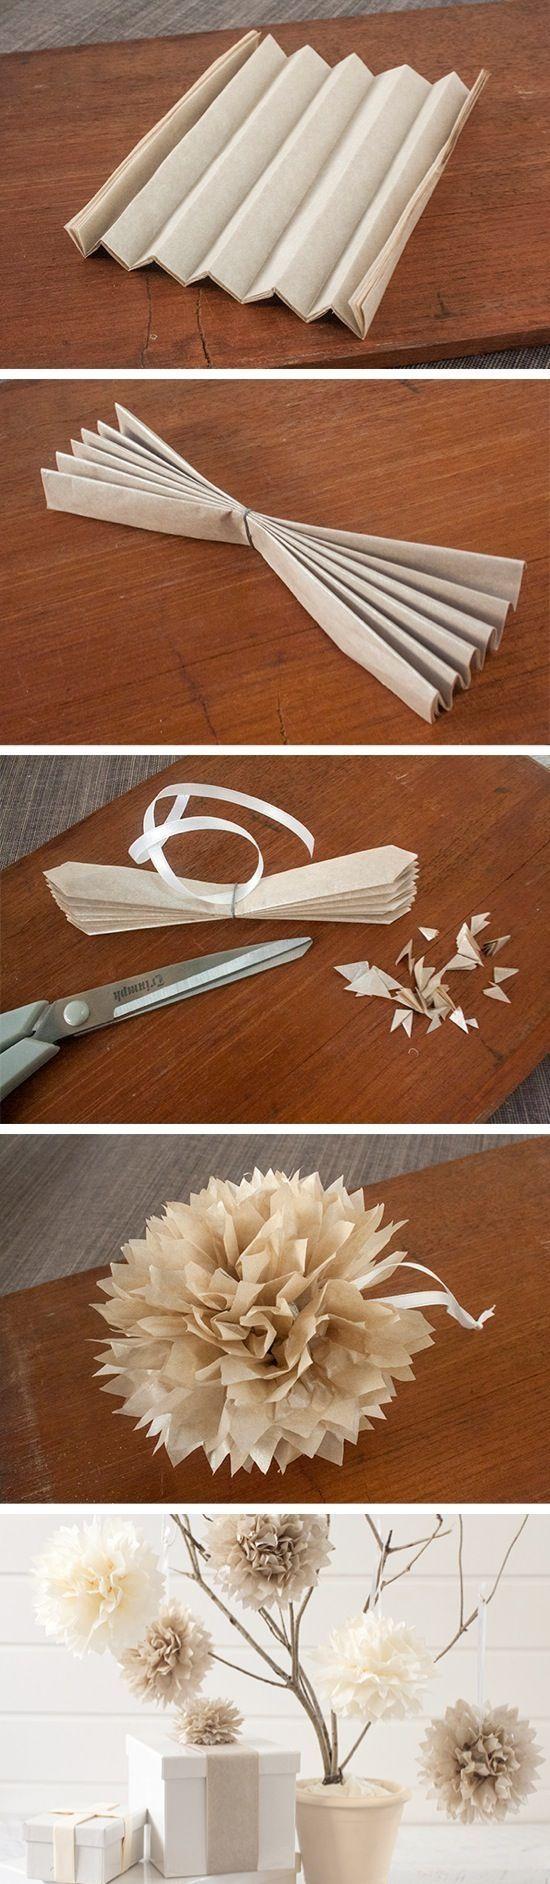 Tissue Paper Pom Poms by Happy Snapz Photography